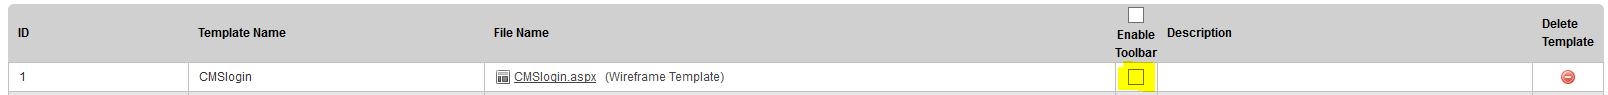 legacy toolbar